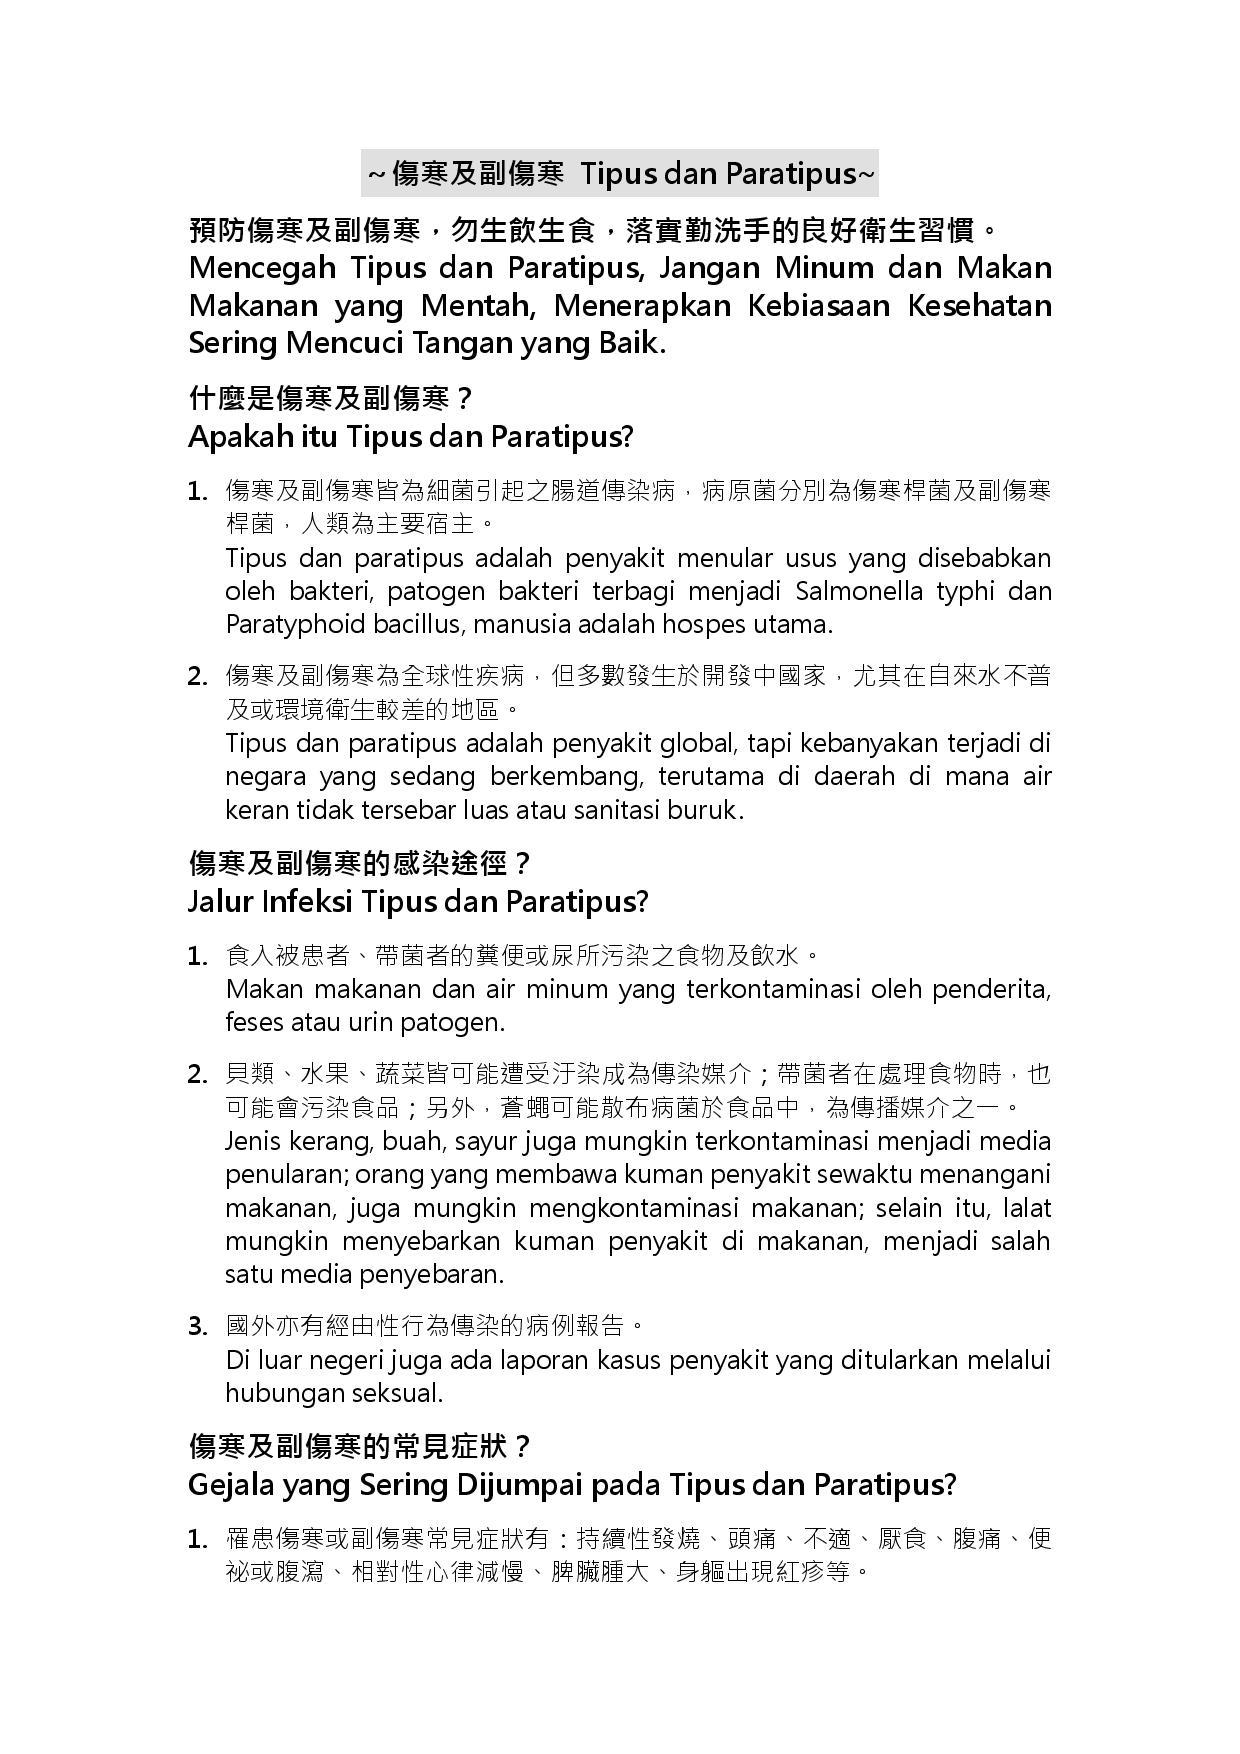 詳如附件【Klik】Mencegah Tipus dan Paratipus(Halaman 1)預防傷寒及副傷寒(印尼文)